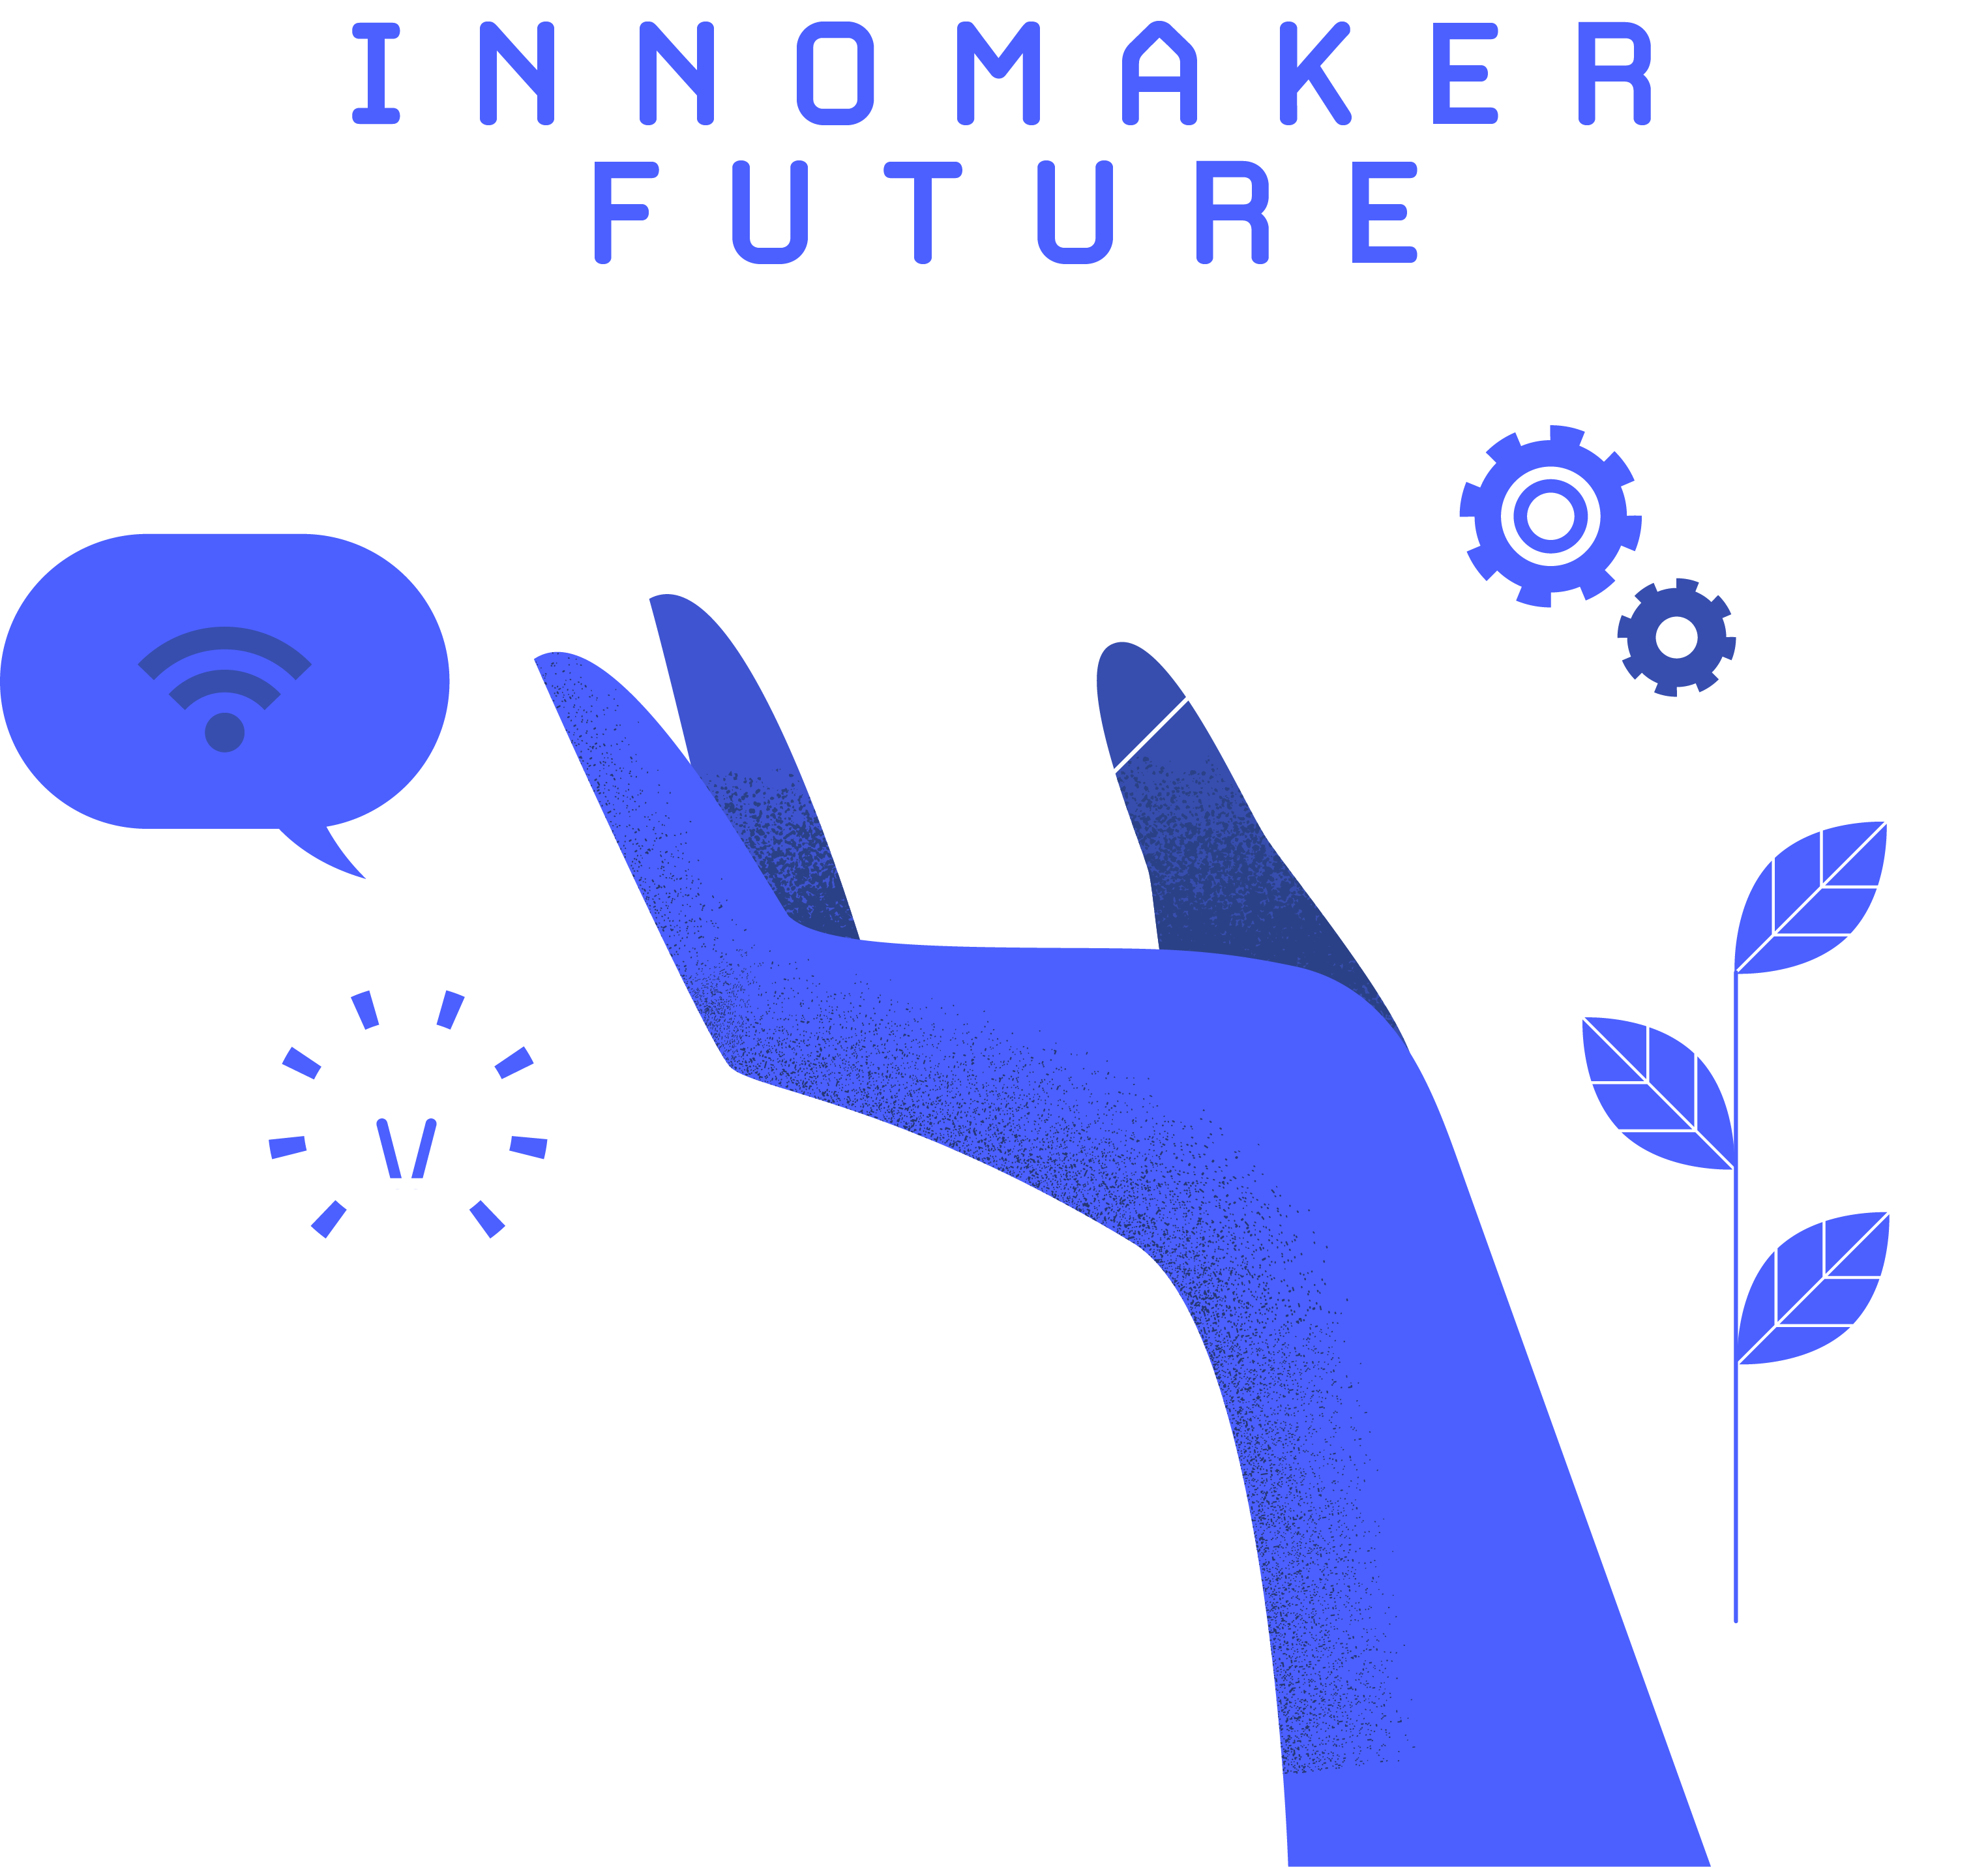 https://www.fablabmalopolska.pl/wp-content/uploads/2021/08/innomaker_future.png